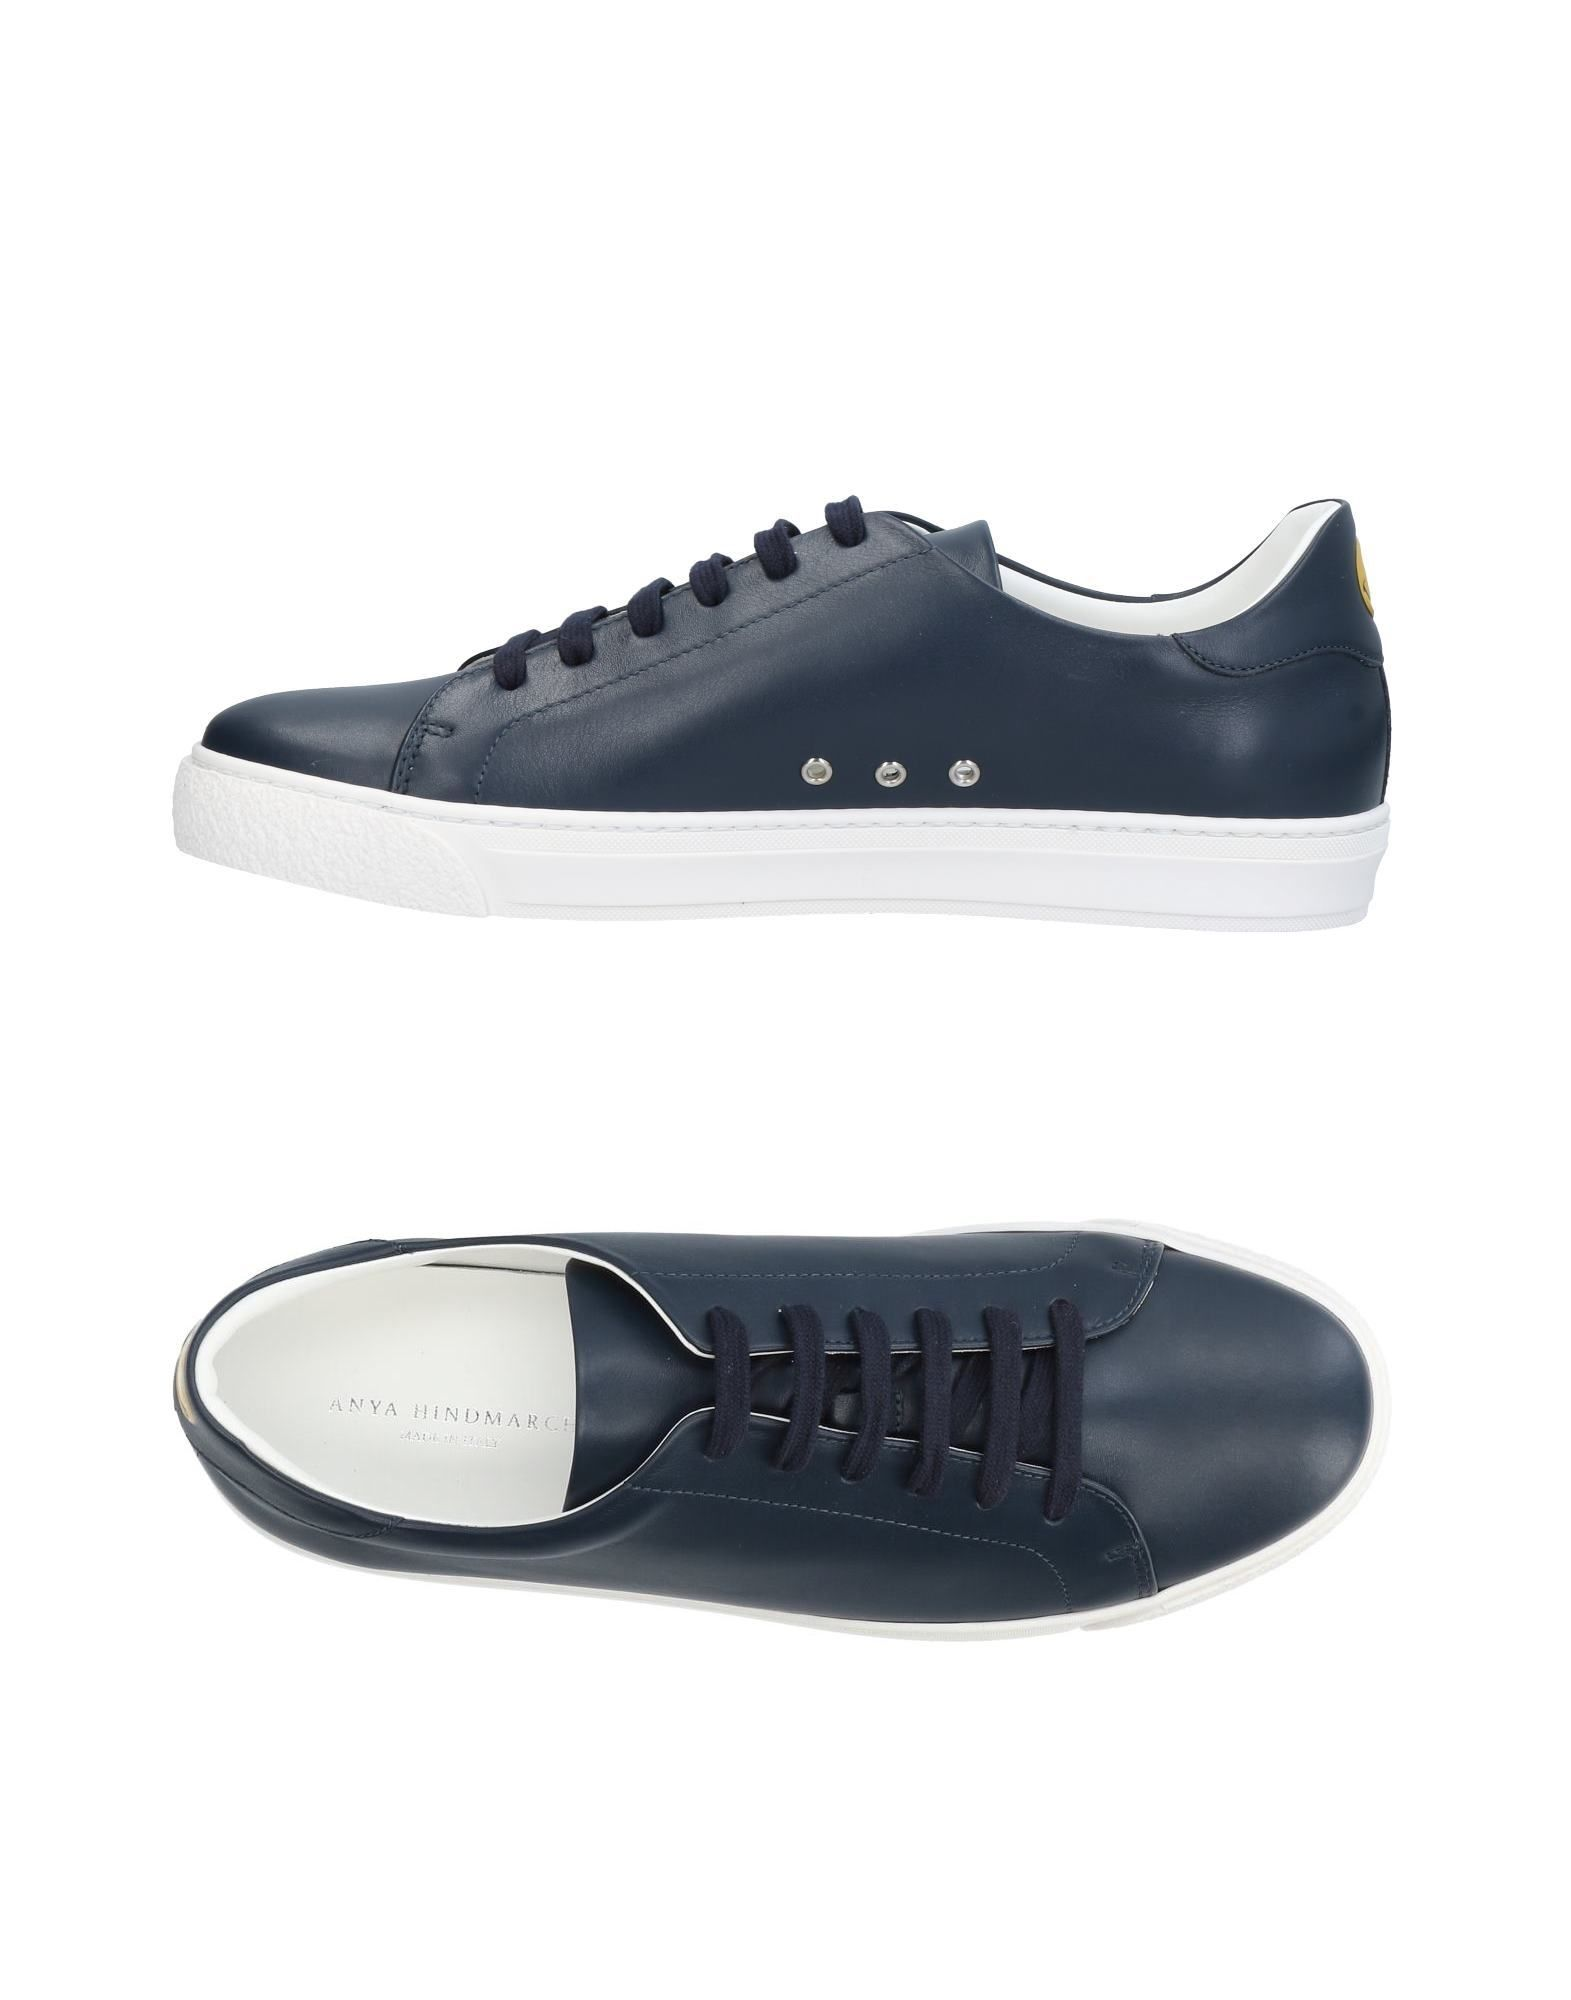 Anya Hindmarch Sneakers Herren  11434514HW Schuhe Neue Schuhe 11434514HW 56f3d1